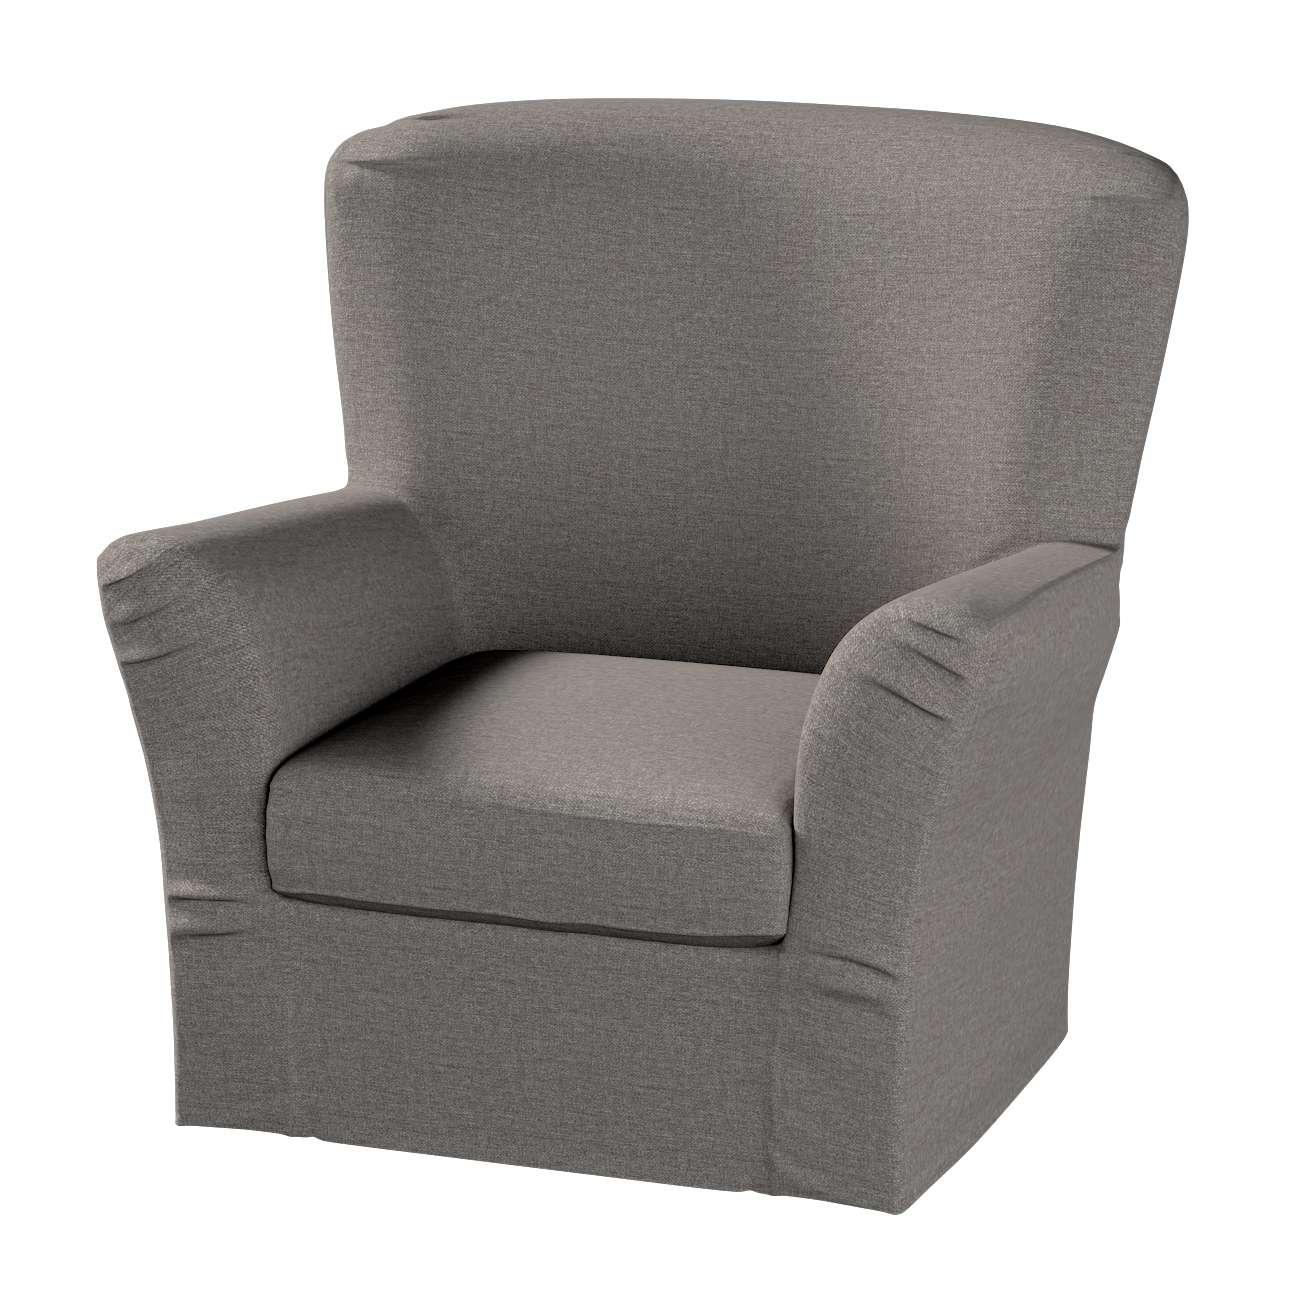 Tomelilla armchair  Tomelilla armchair in collection Edinburgh, fabric: 115-77